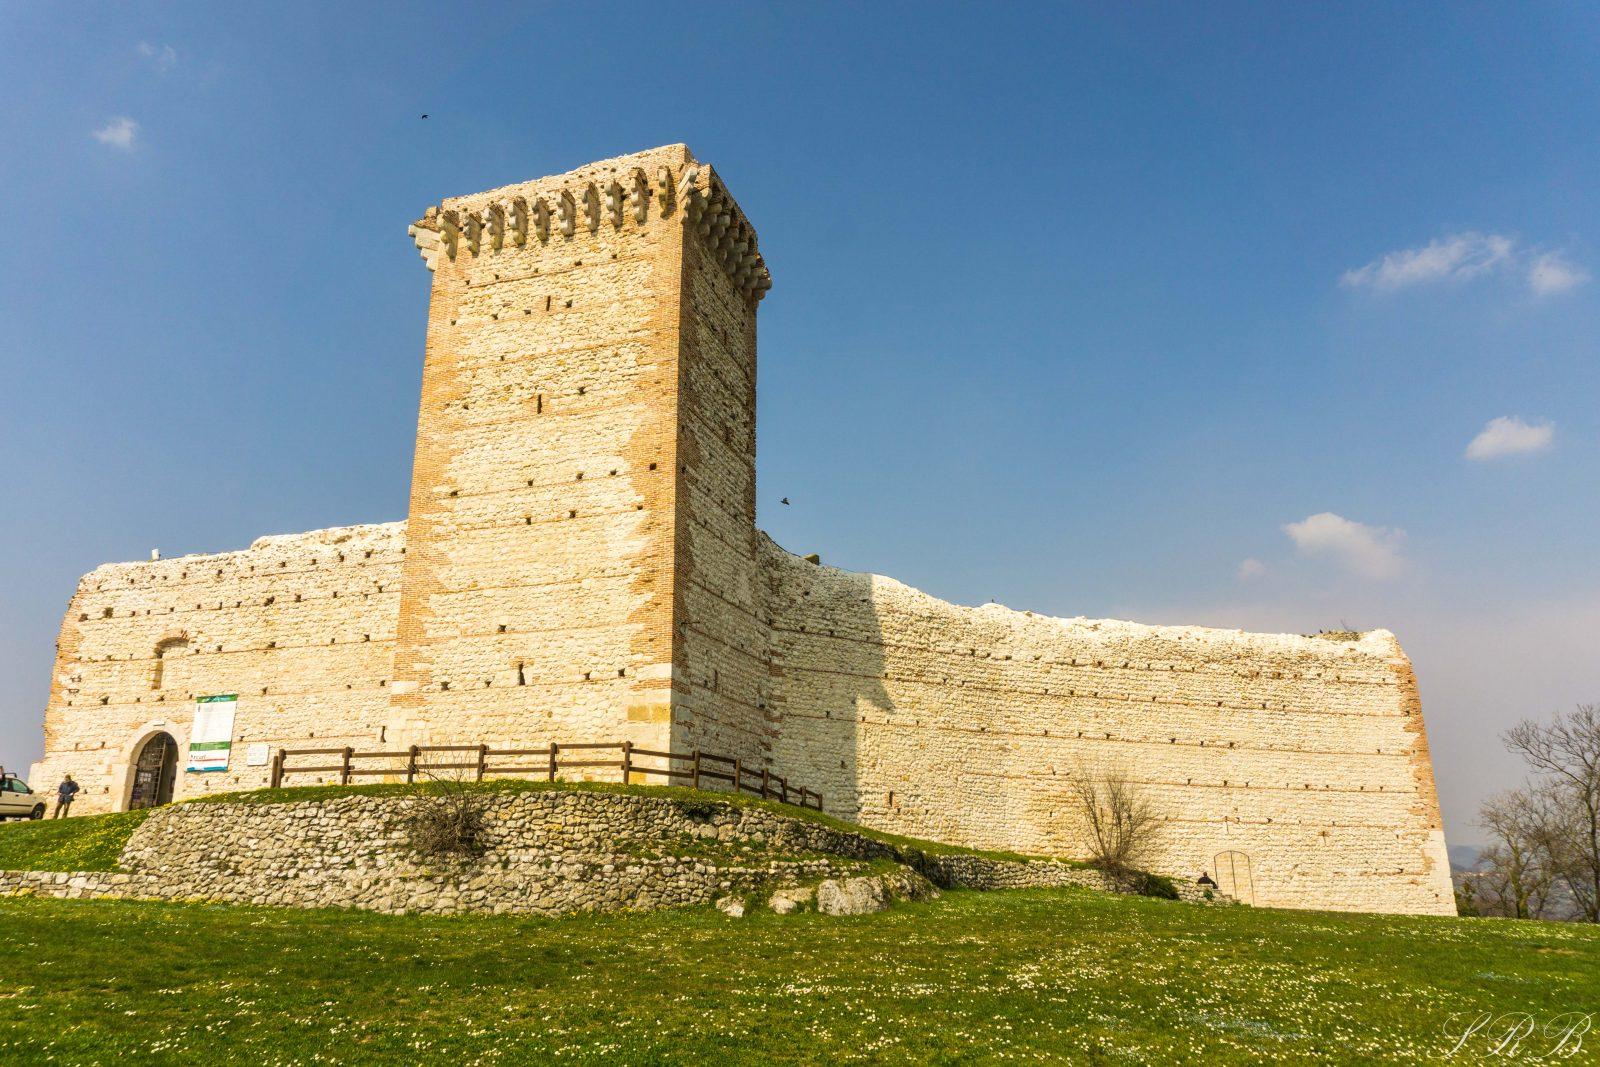 Walls of Romeo's Castle